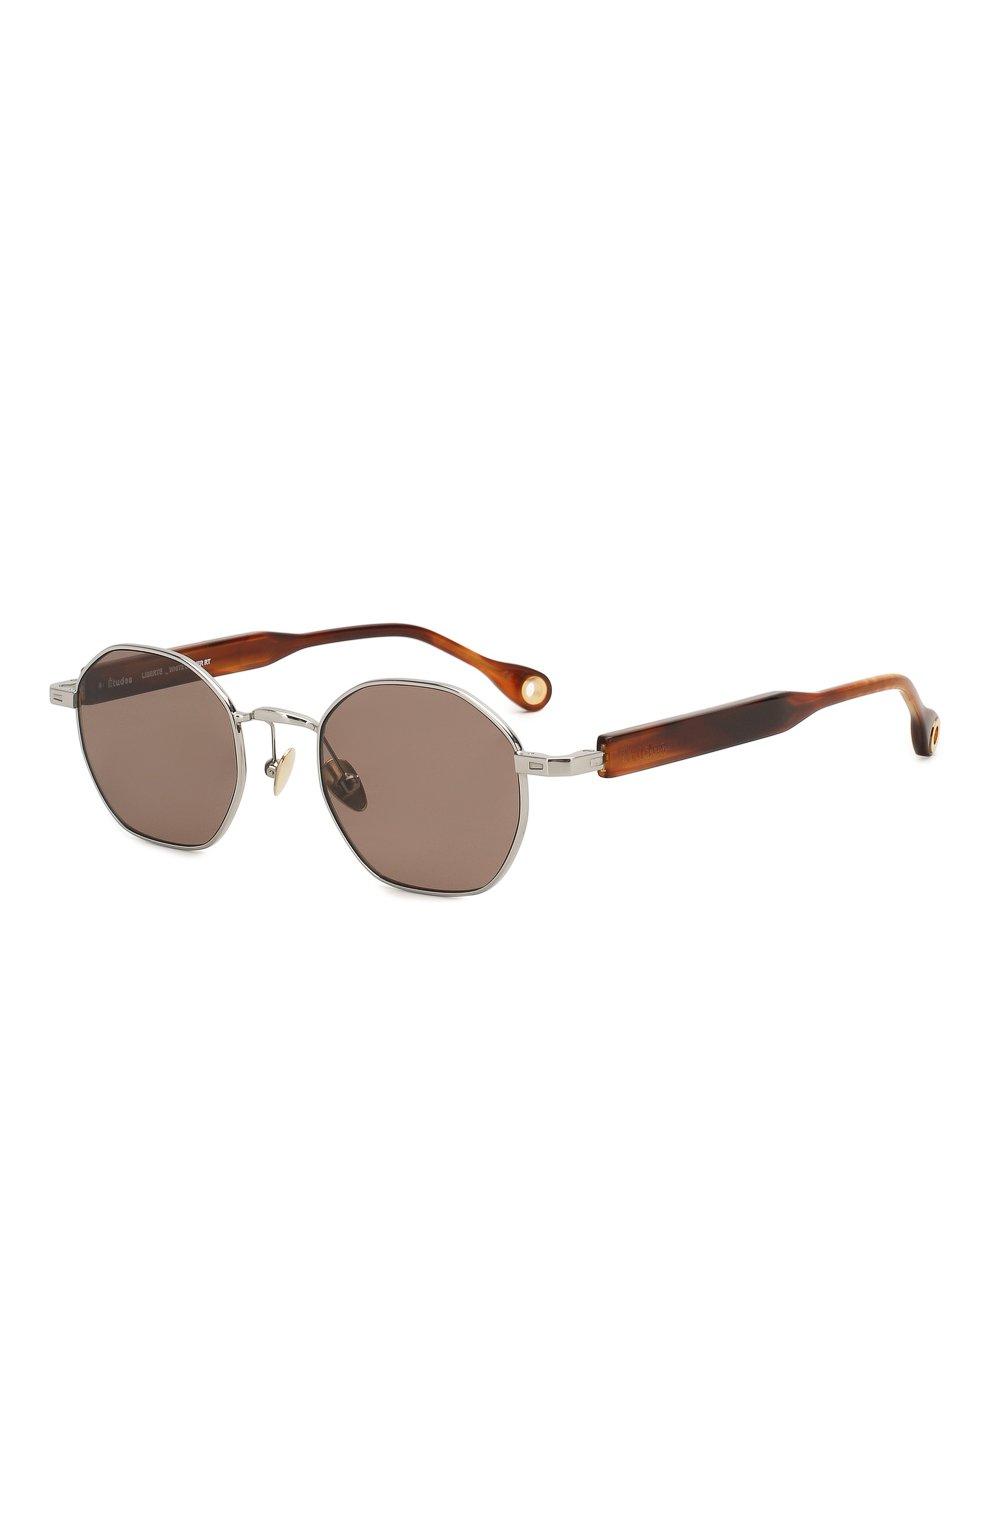 Женские солнцезащитные очки ÉTUDES серебряного цвета, арт. LIBERTE WHITE SILVER RT WITH CHAIN | Фото 4